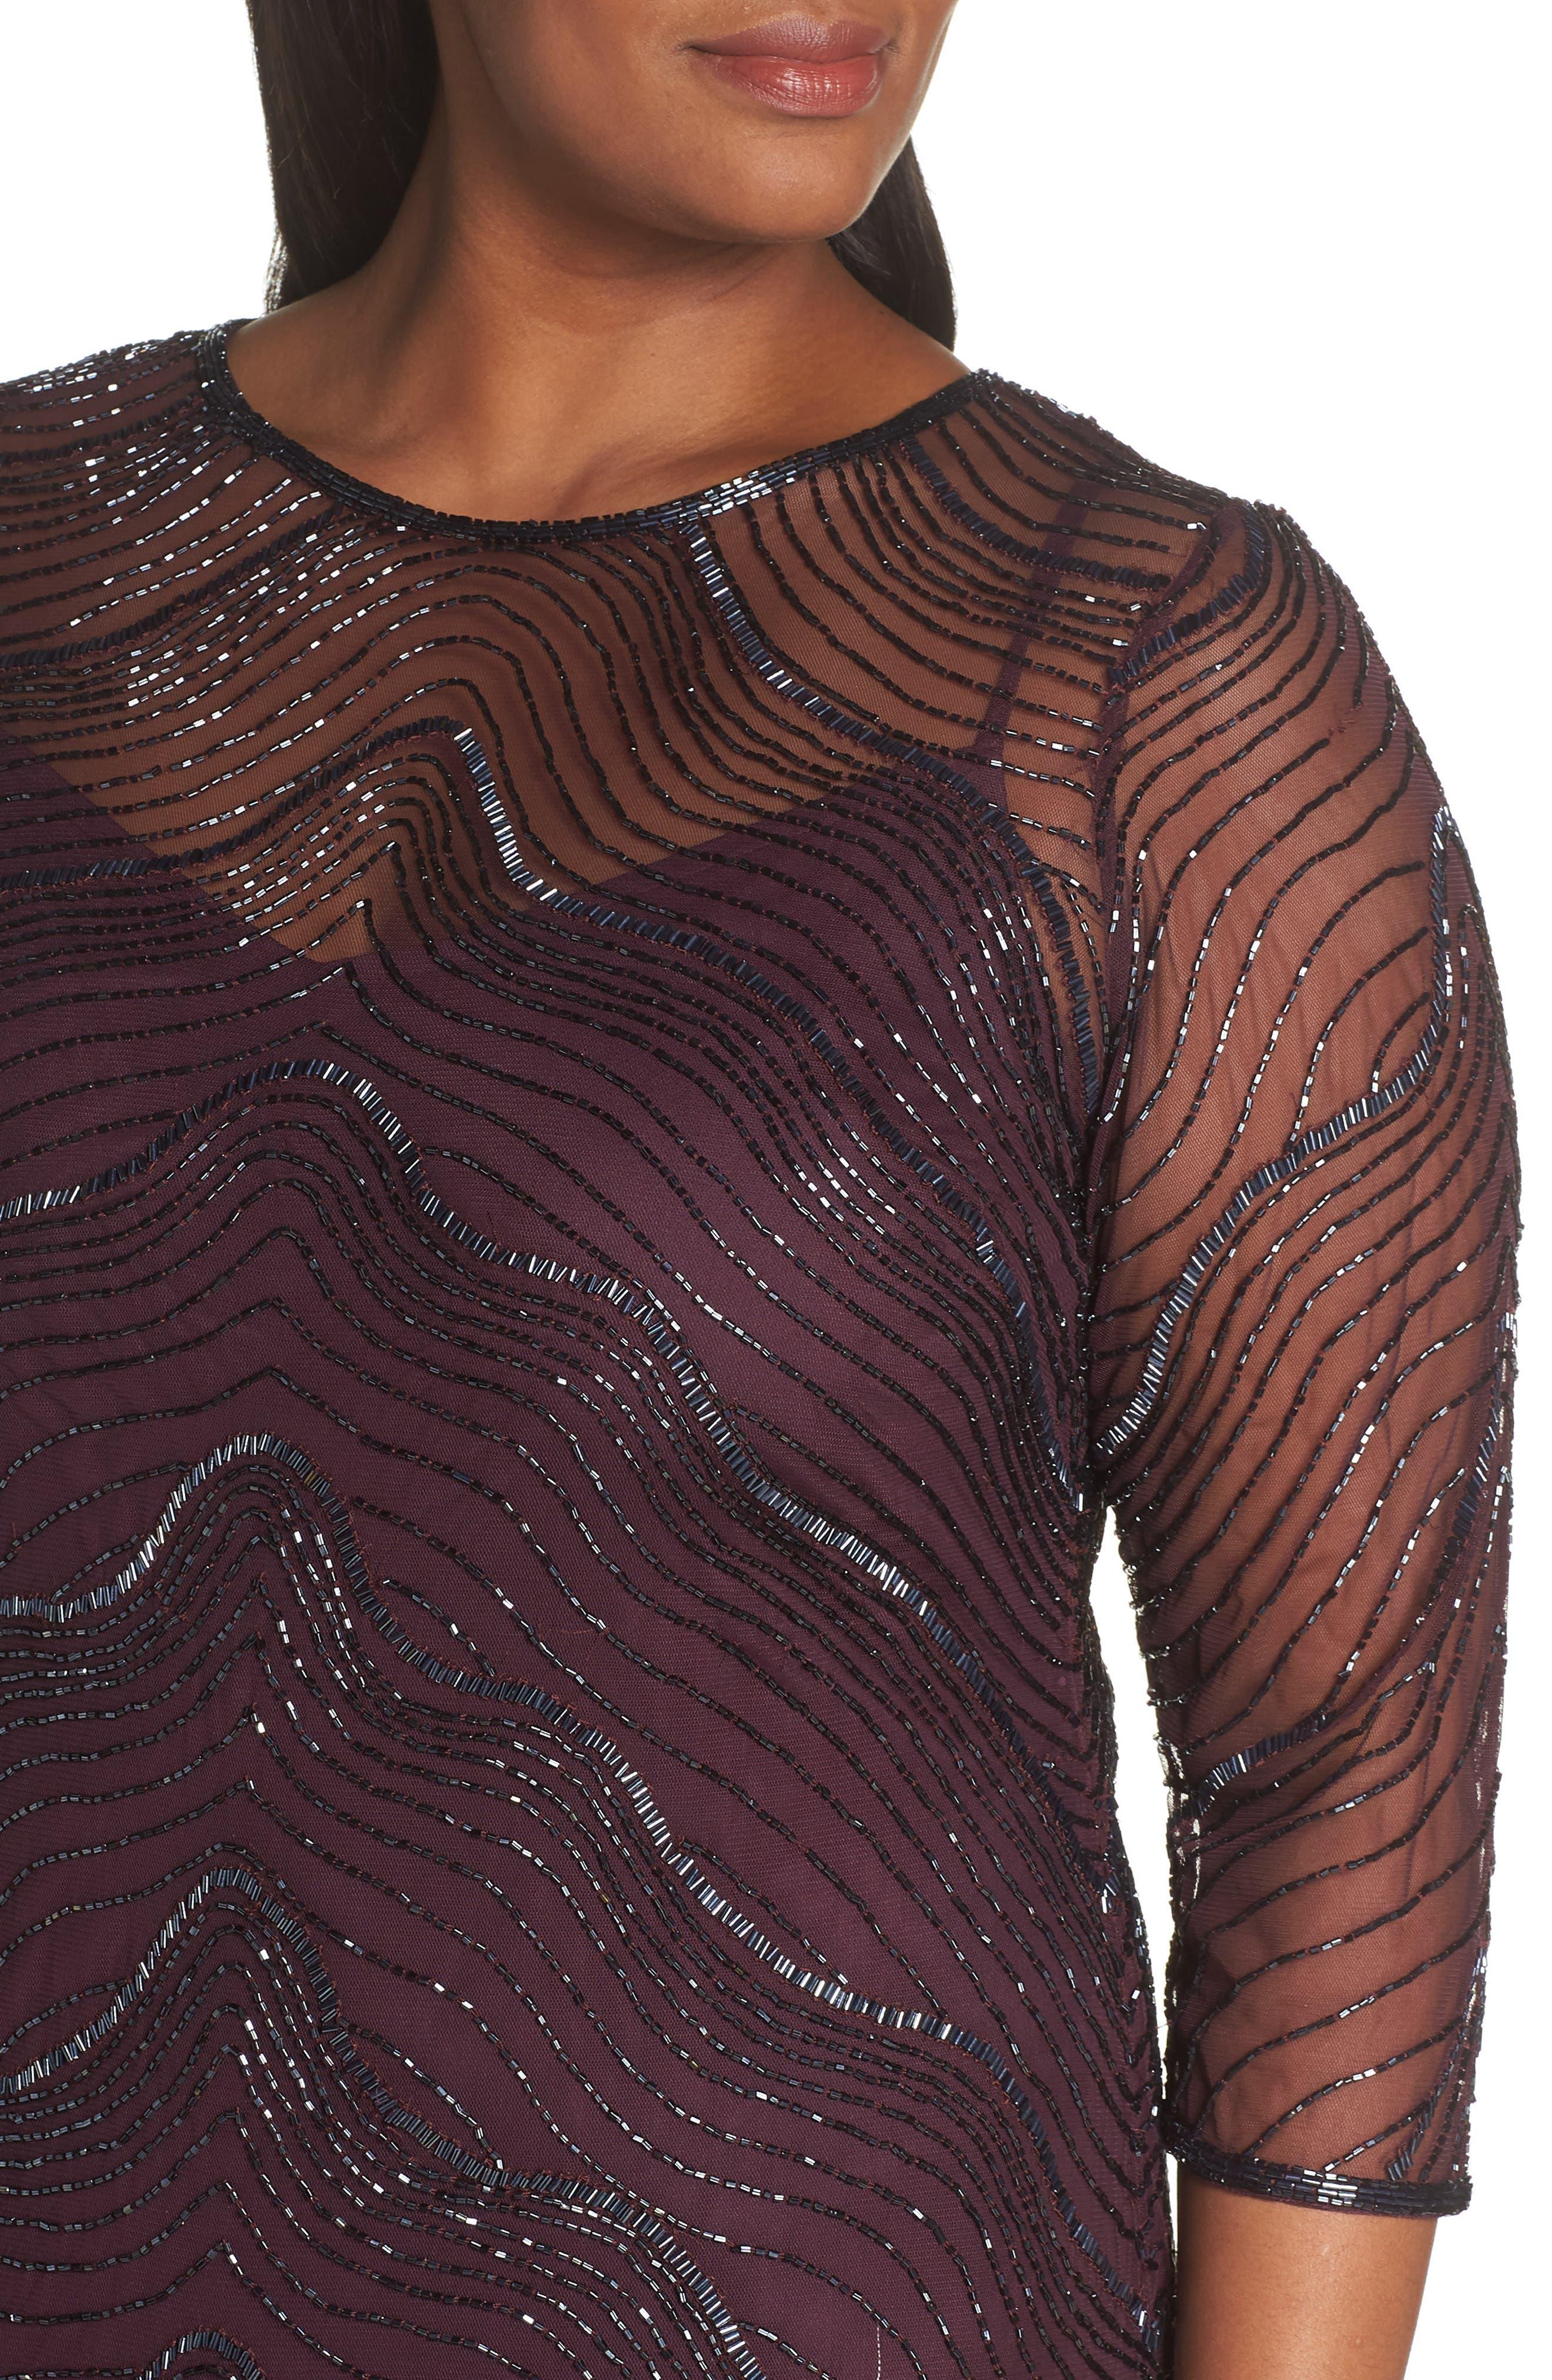 Deco Beaded Godet Gown,                             Alternate thumbnail 4, color,                             500